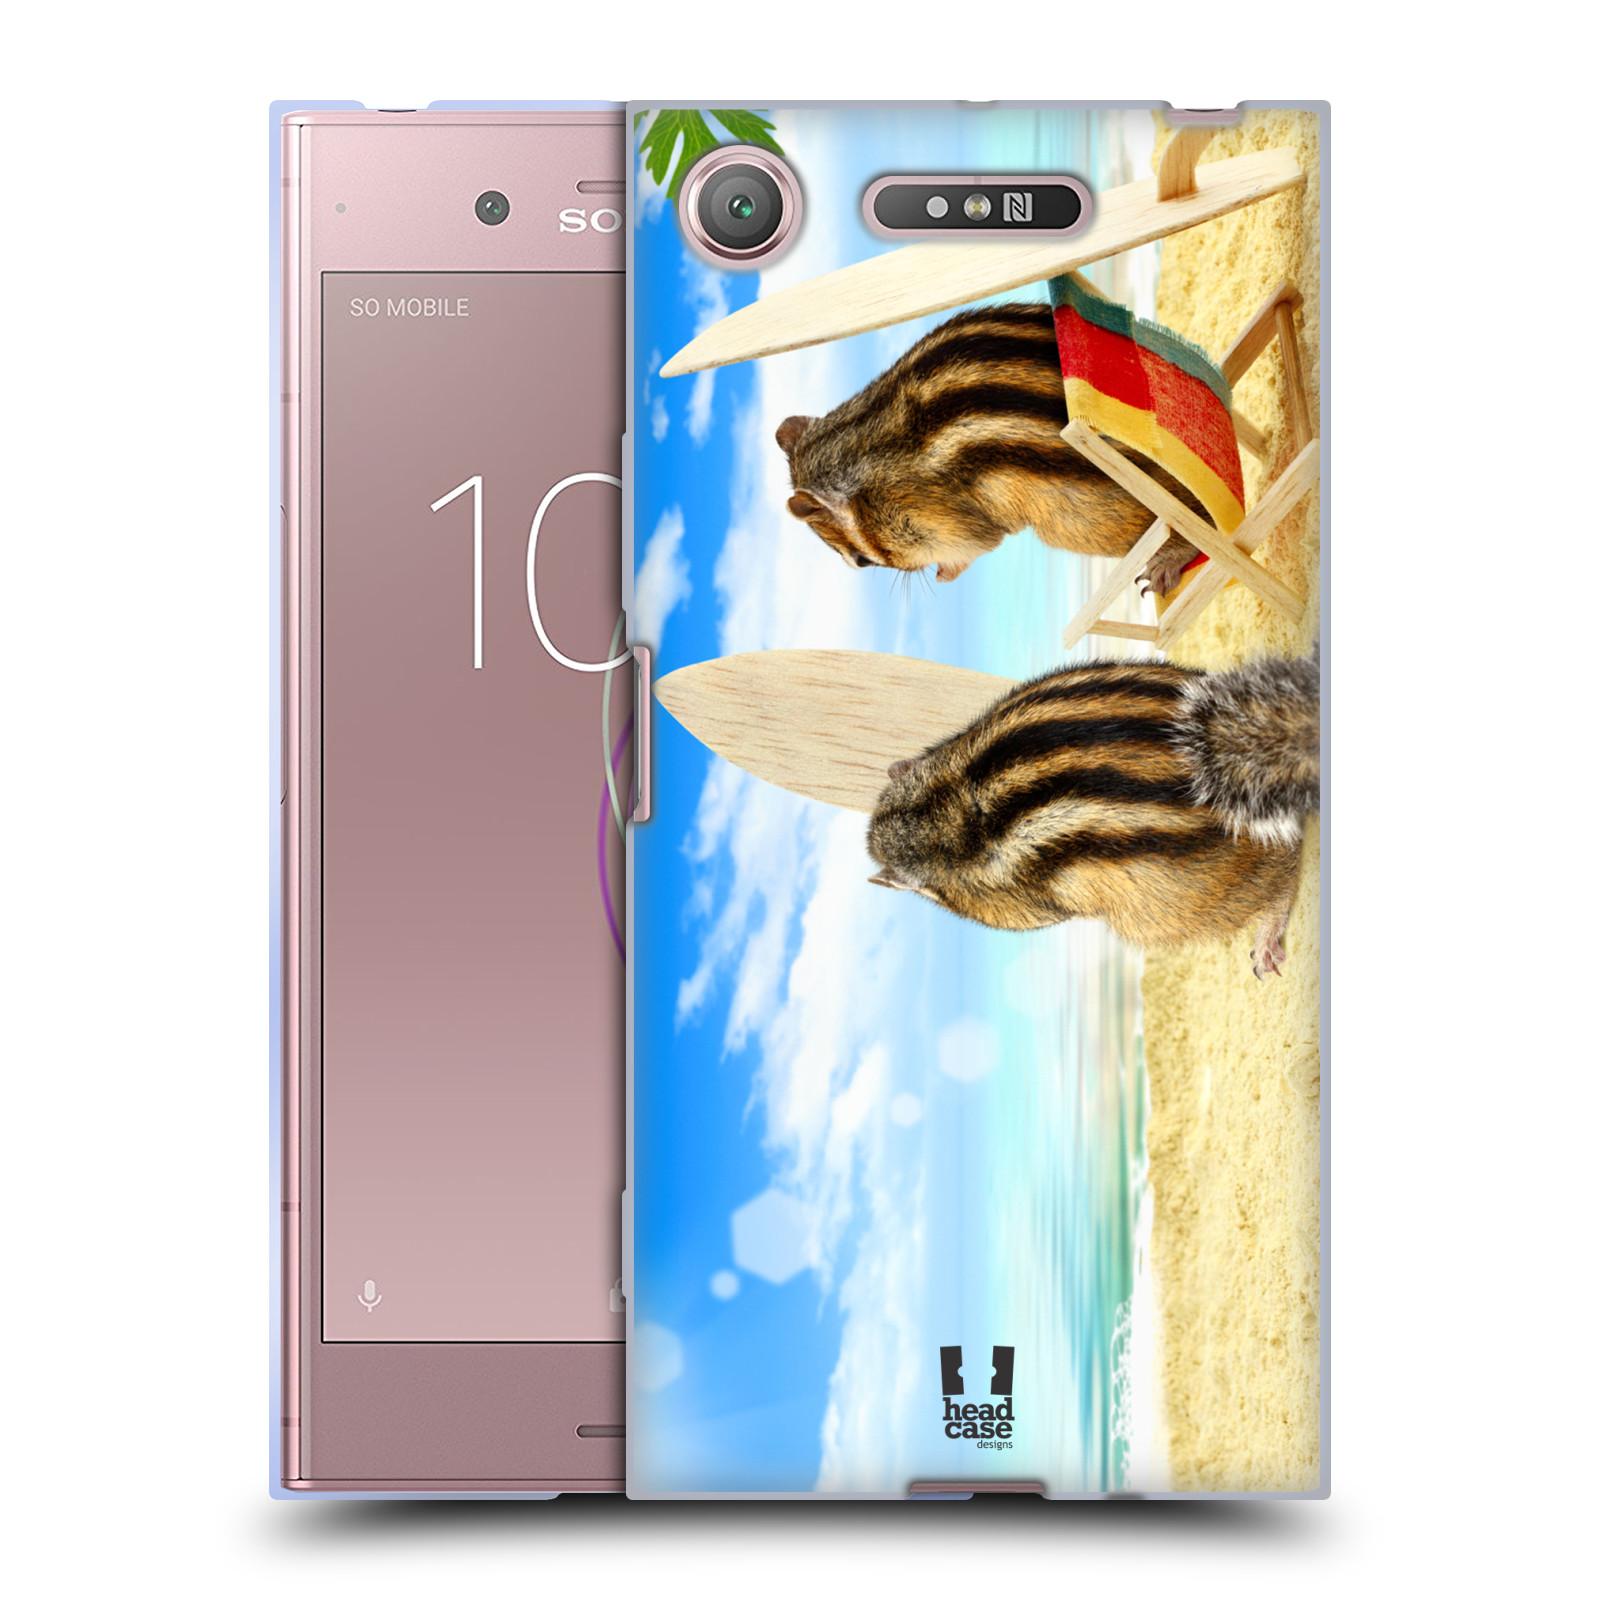 HEAD CASE silikonový obal na mobil Sony Xperia XZ1 vzor Legrační zvířátka veverky surfaři u moře